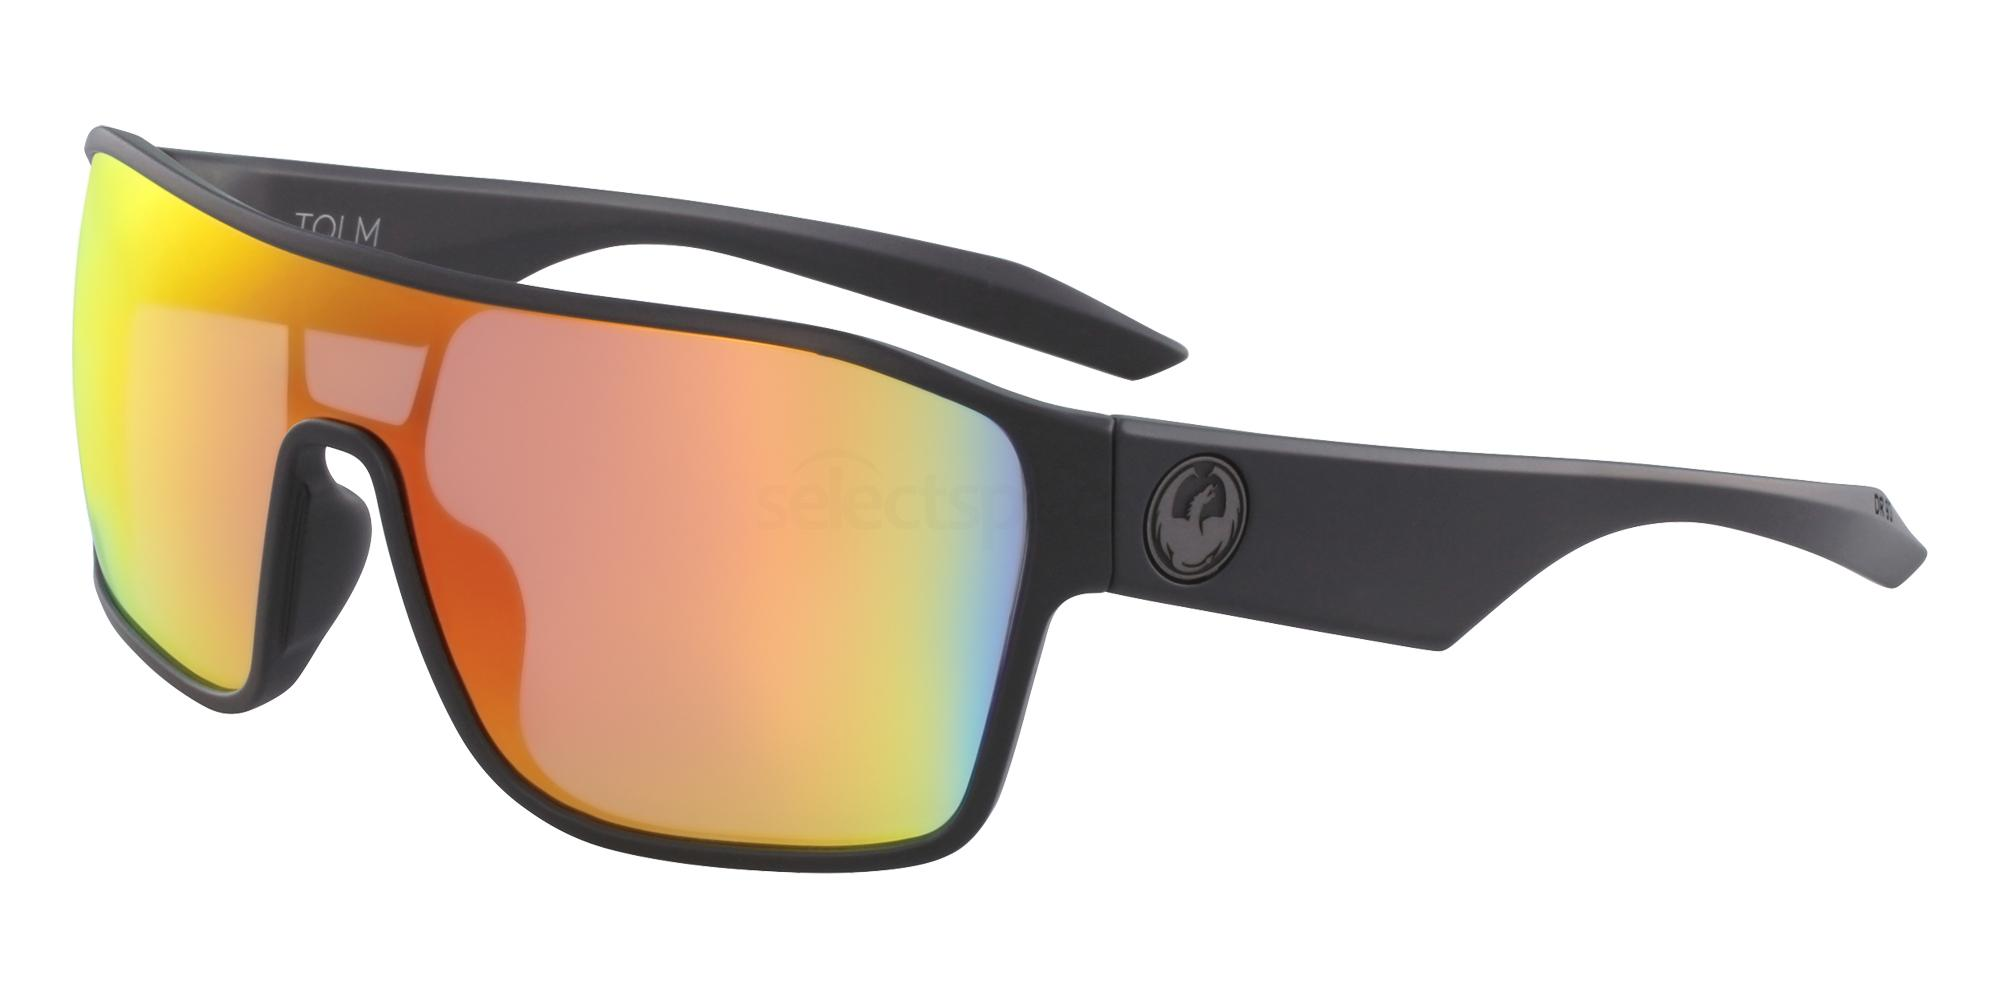 022 DR TOLM LL ION Sunglasses, Dragon